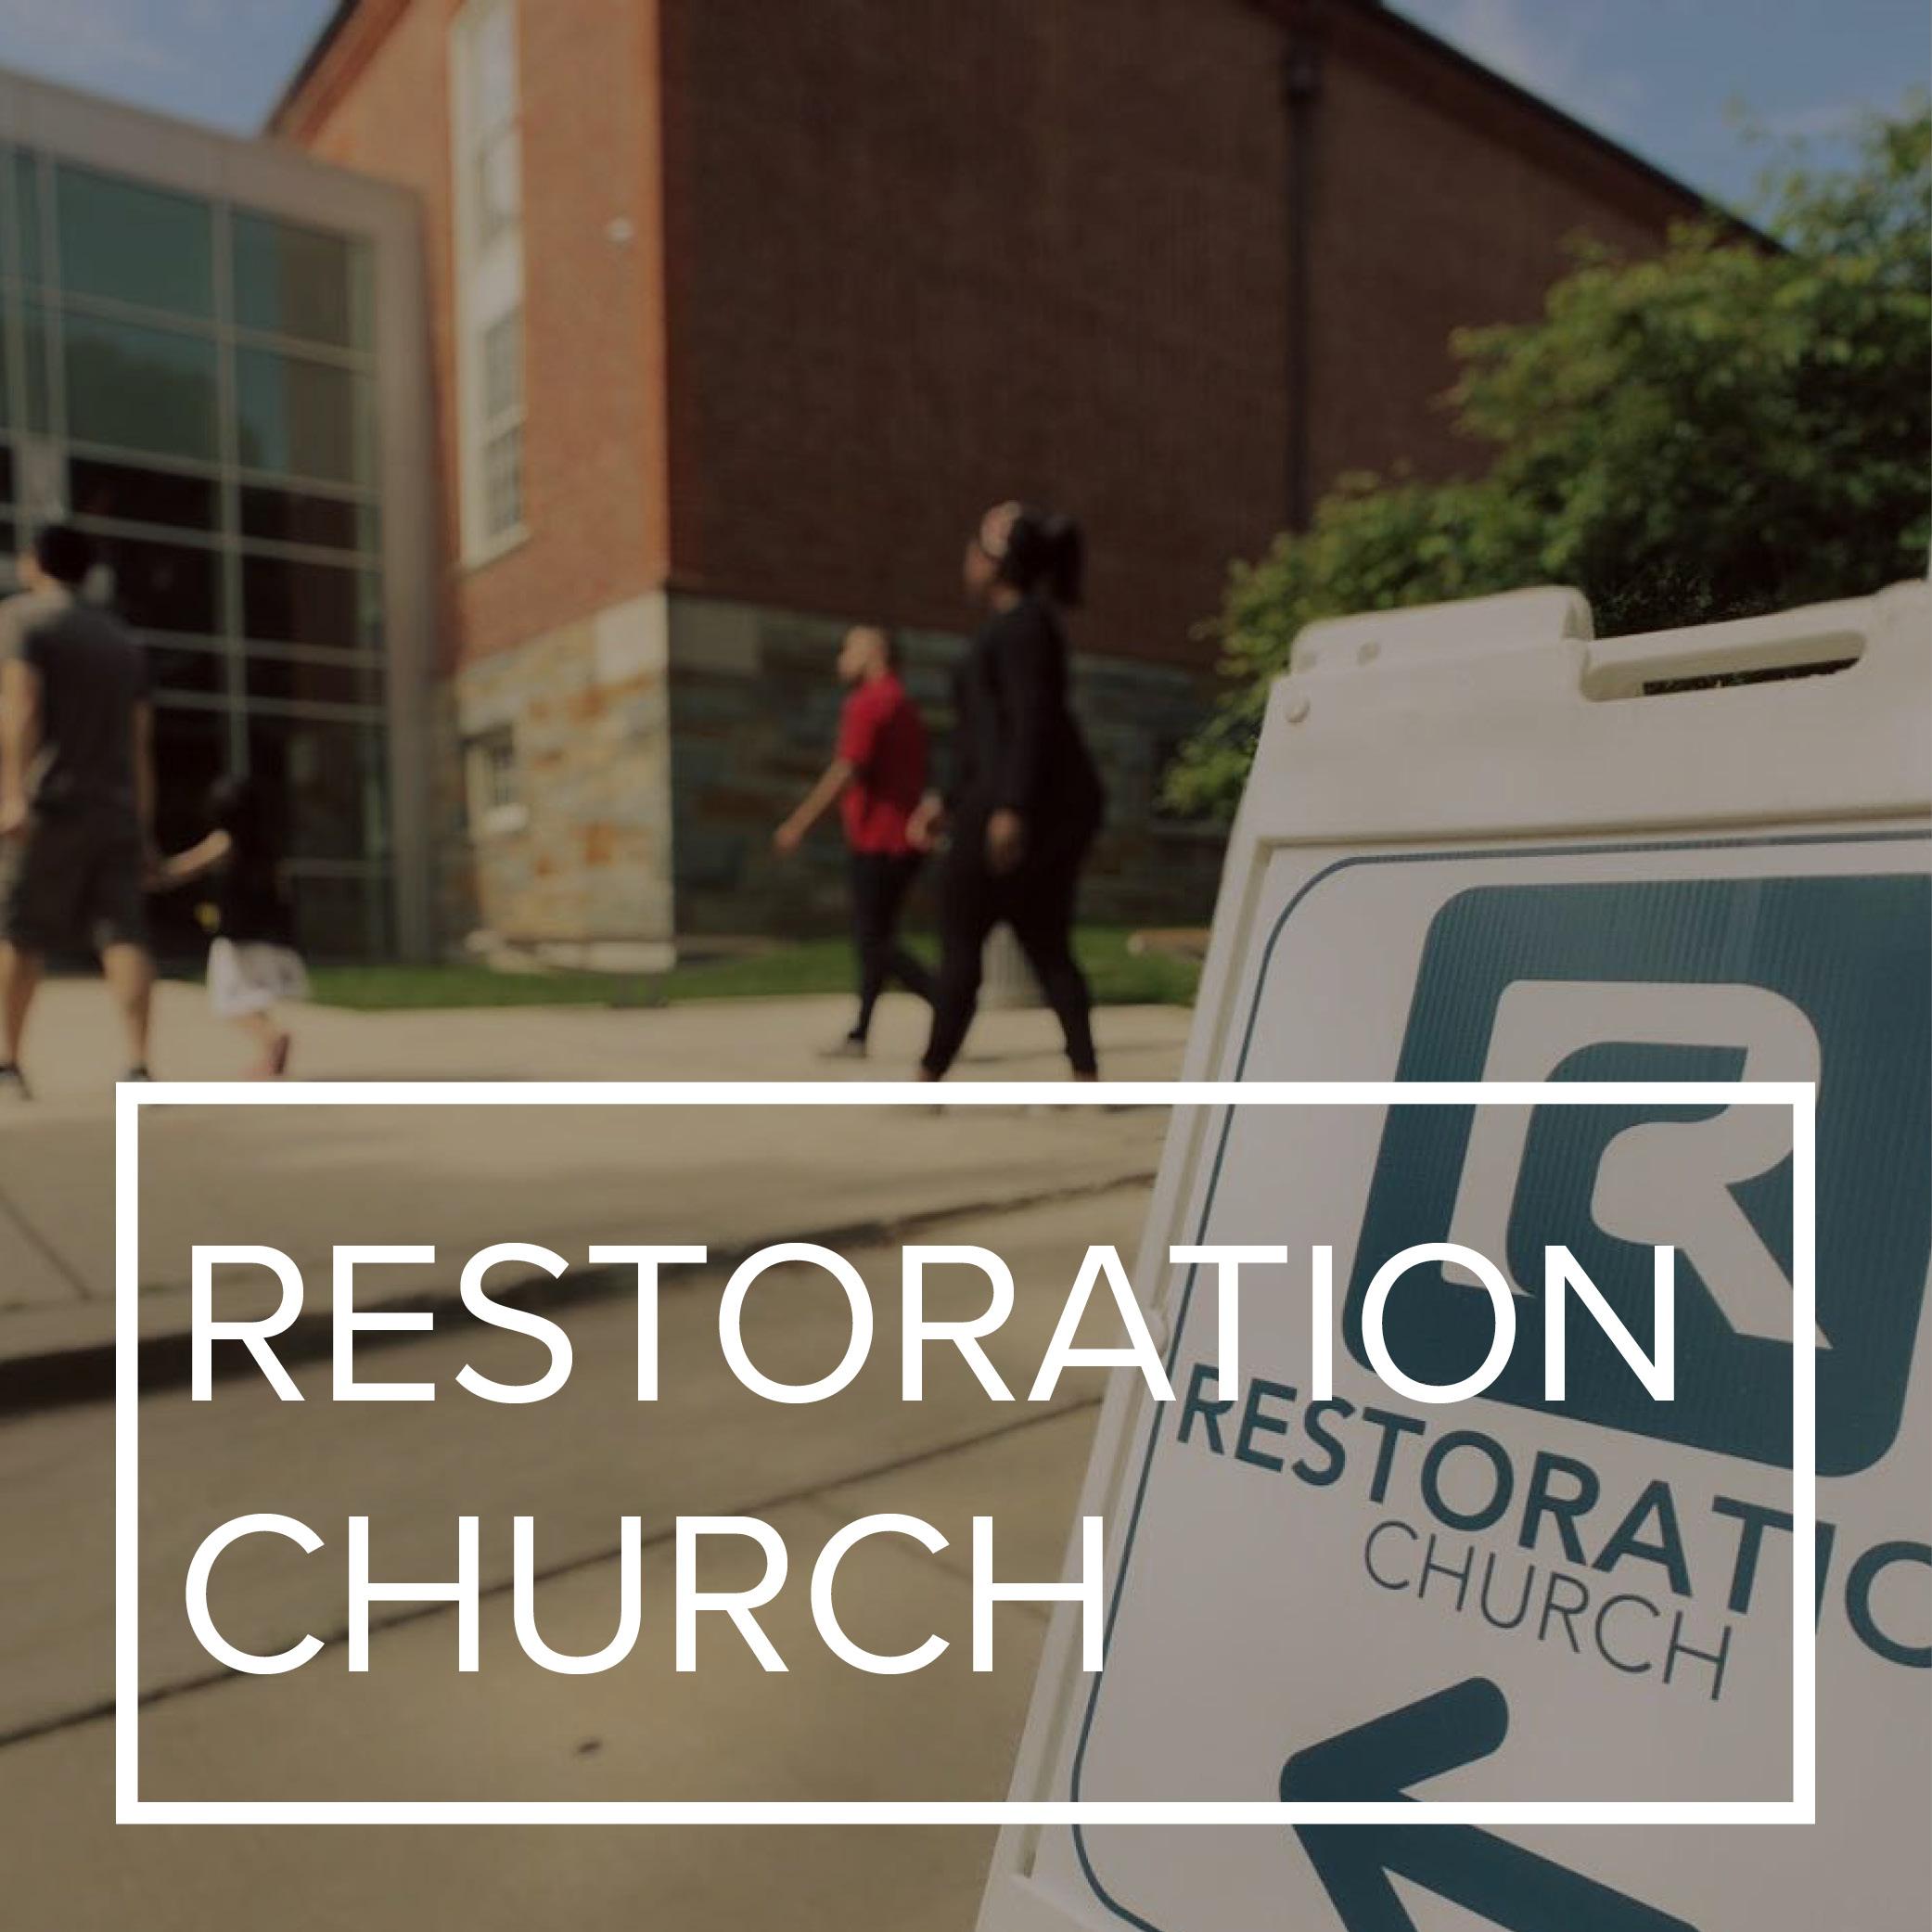 Restorationchurch.jpg